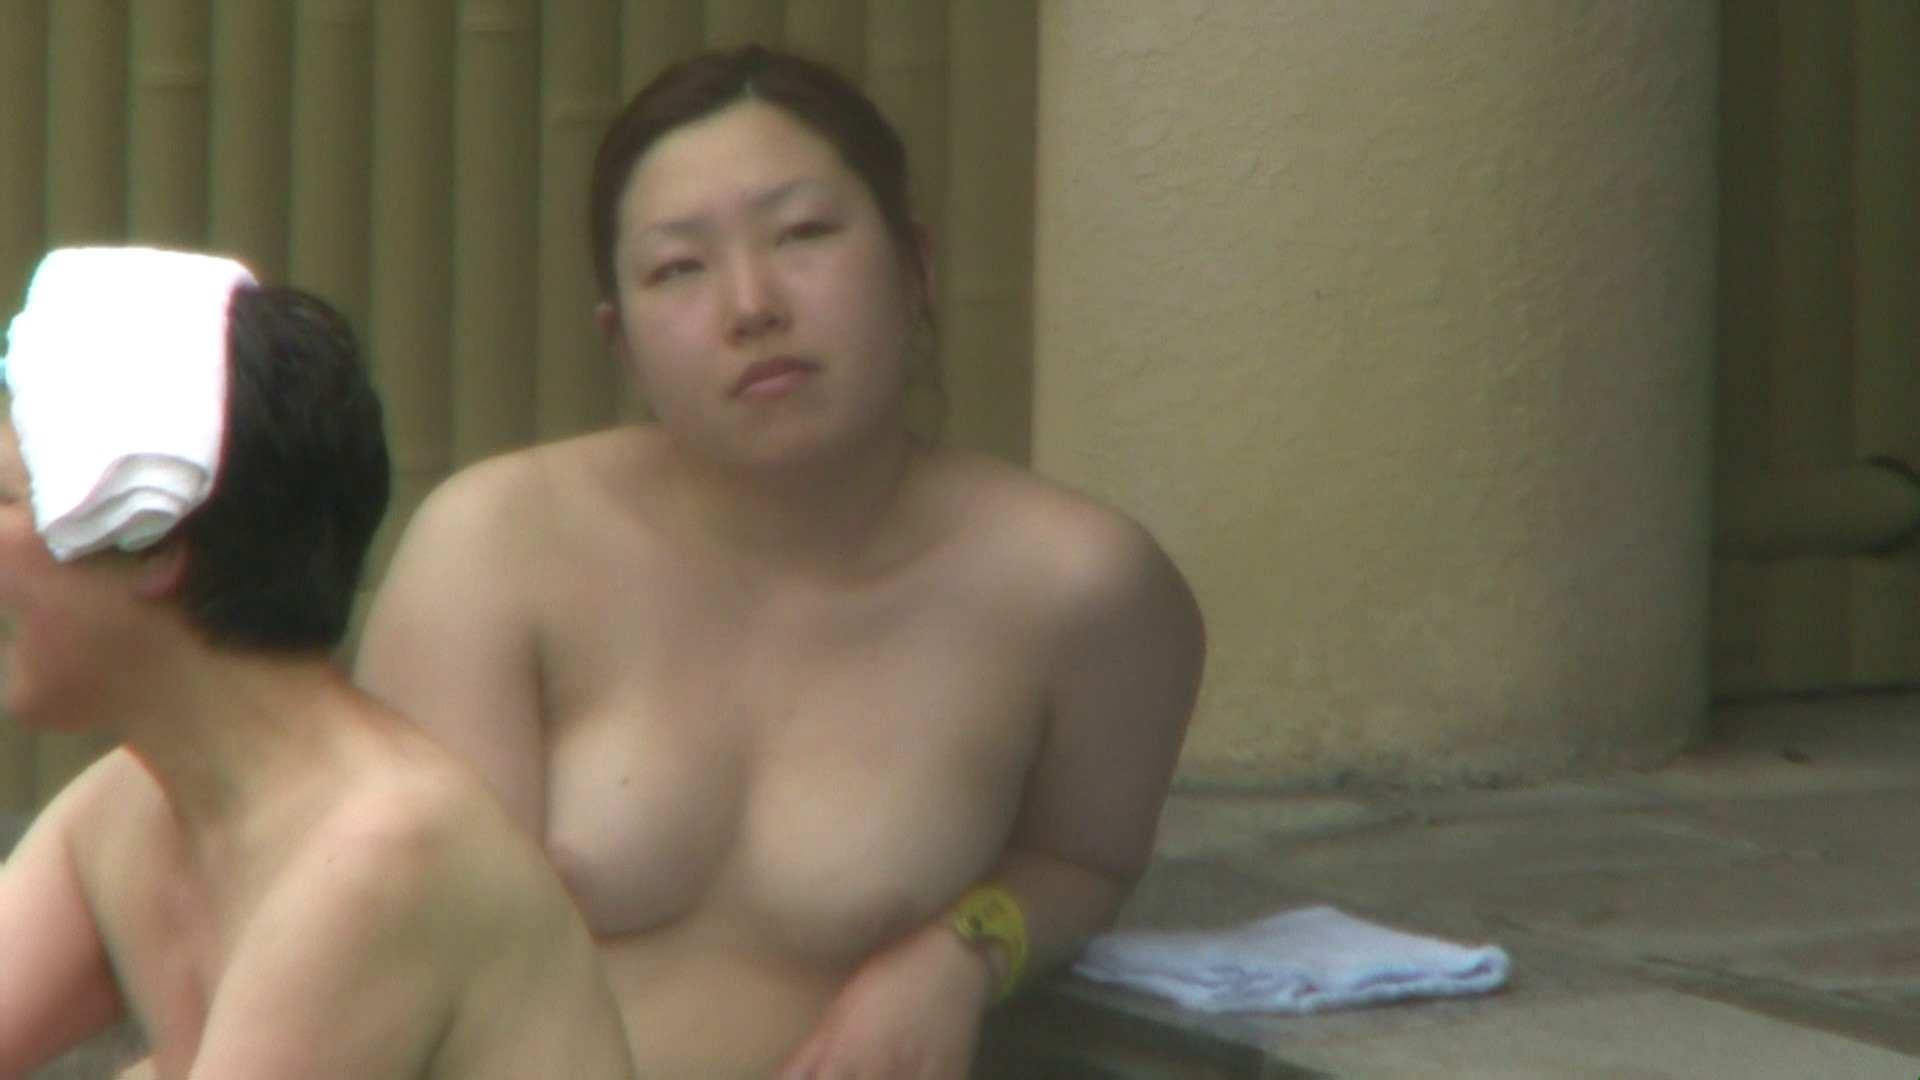 Aquaな露天風呂Vol.72【VIP限定】 露天風呂編 | 盗撮シリーズ  98PIX 3